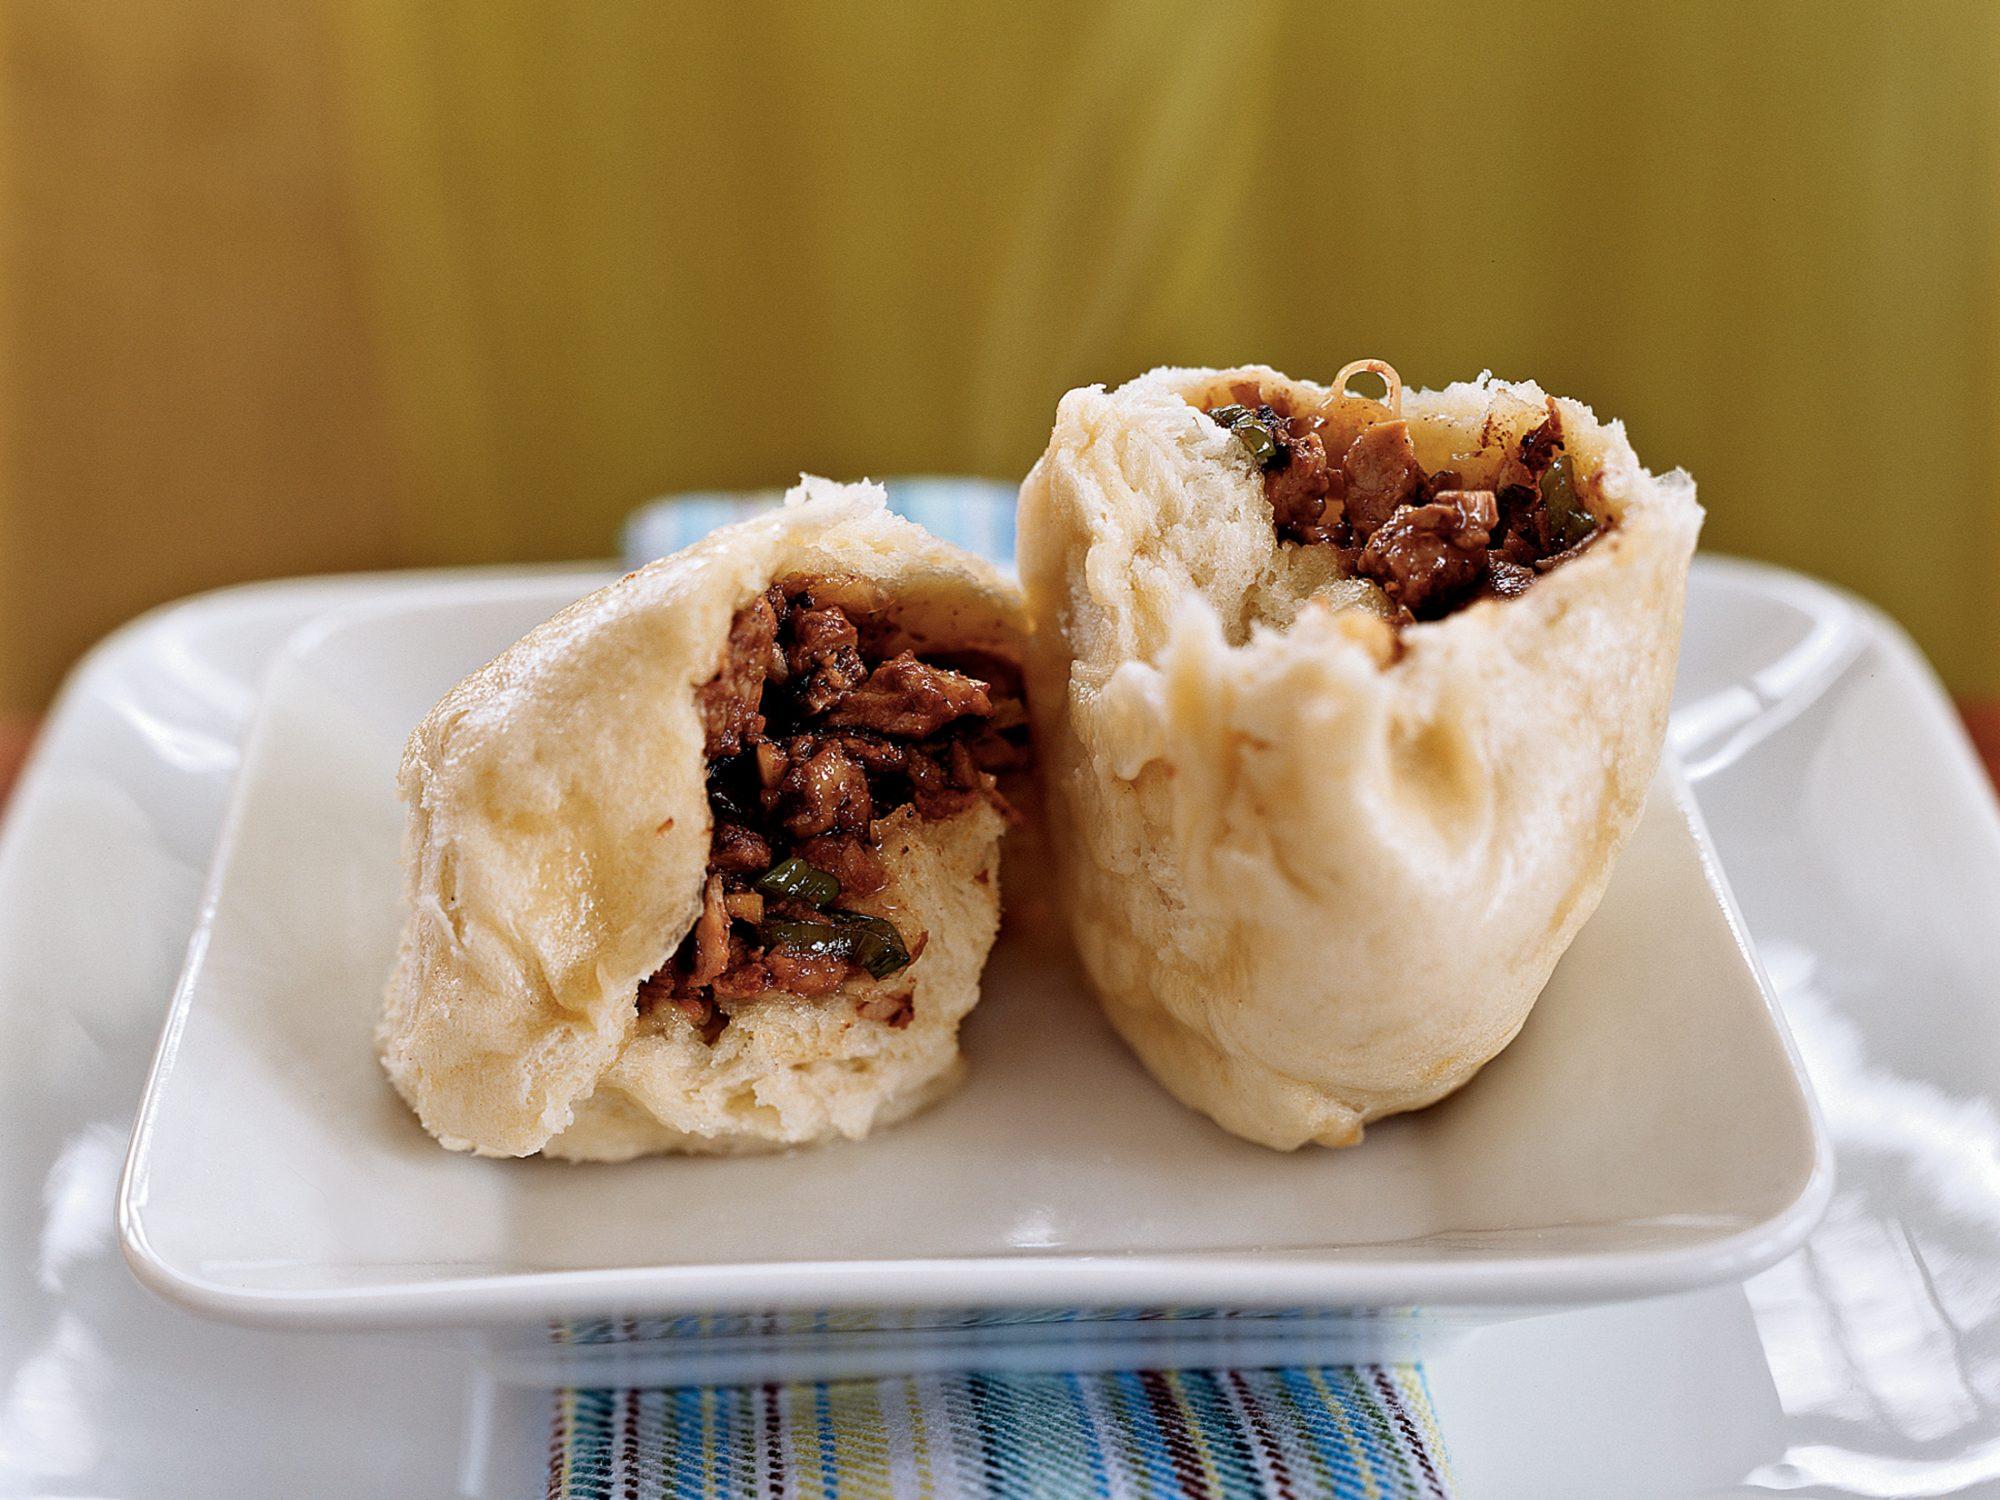 Steamed Pork Buns (Char Siu Bao)